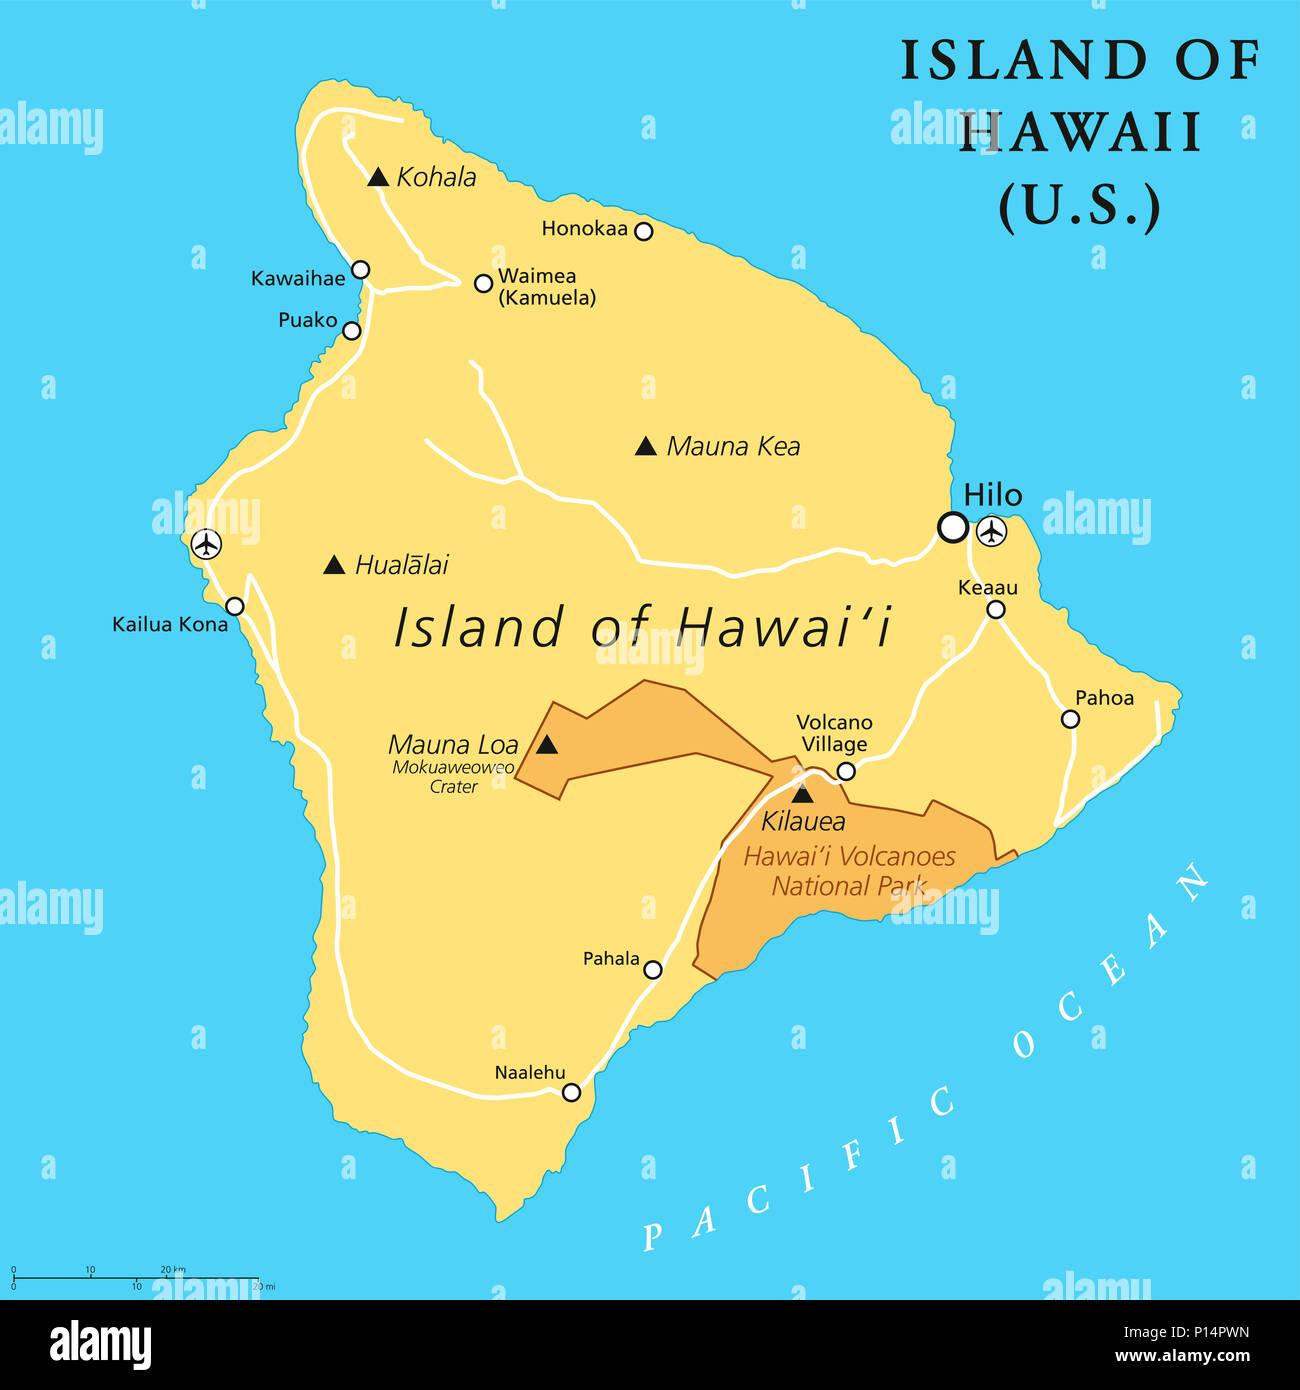 Kohala Hawaii Map.Island Of Hawaii Political Map Largest Island Located In The U S